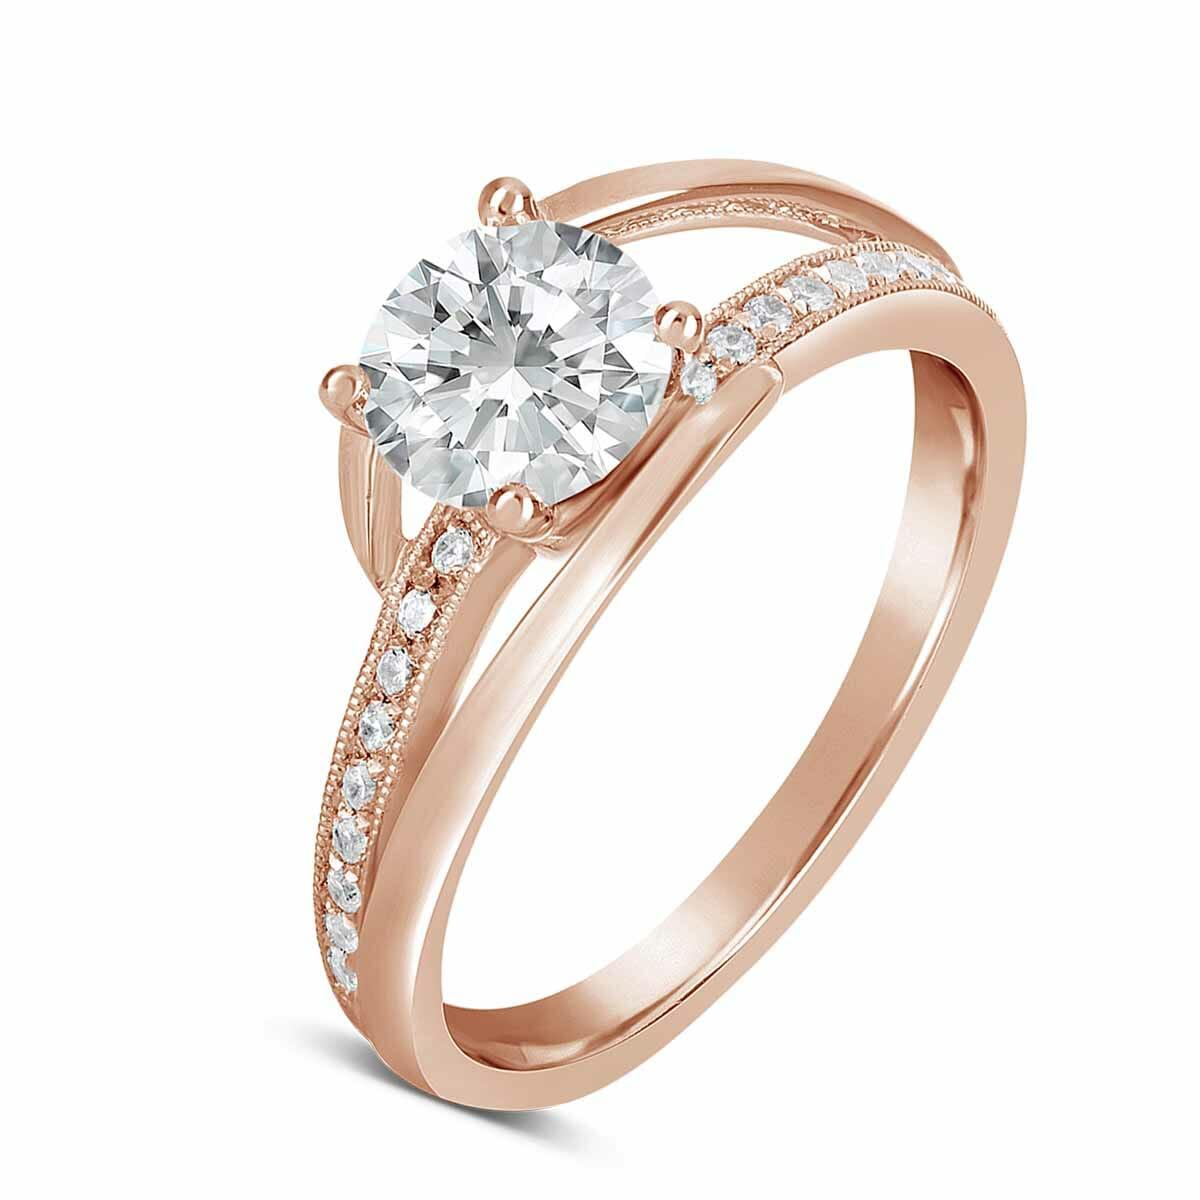 Modern Diamond Engagement Ring - The Diamond Guys Collection